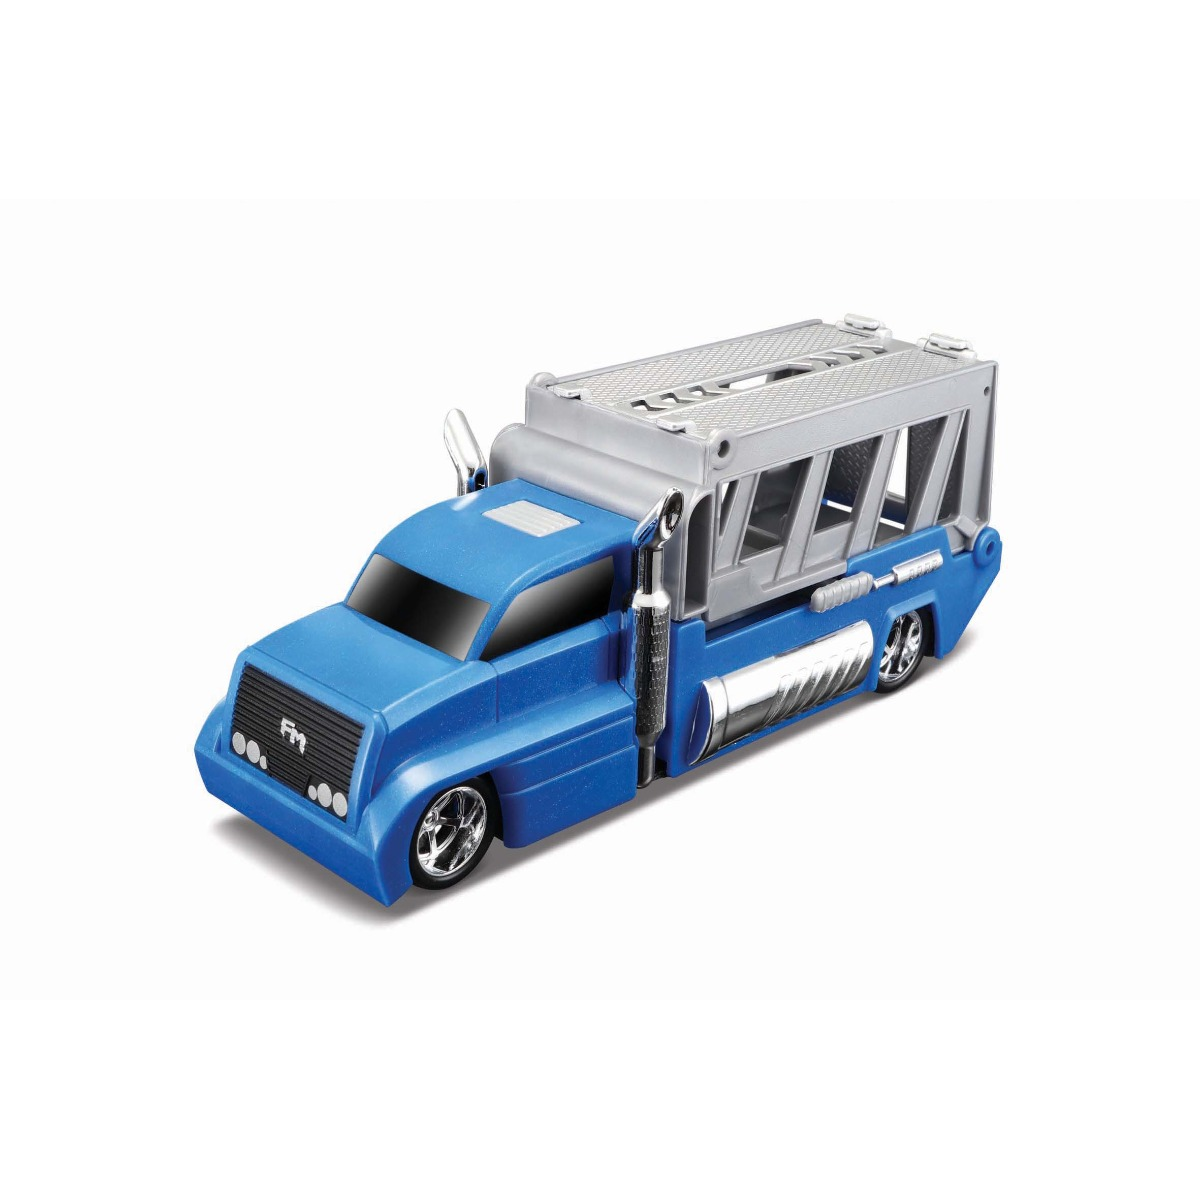 Set masinuta, camion si cheie Maisto, Albastru/Portocaliu